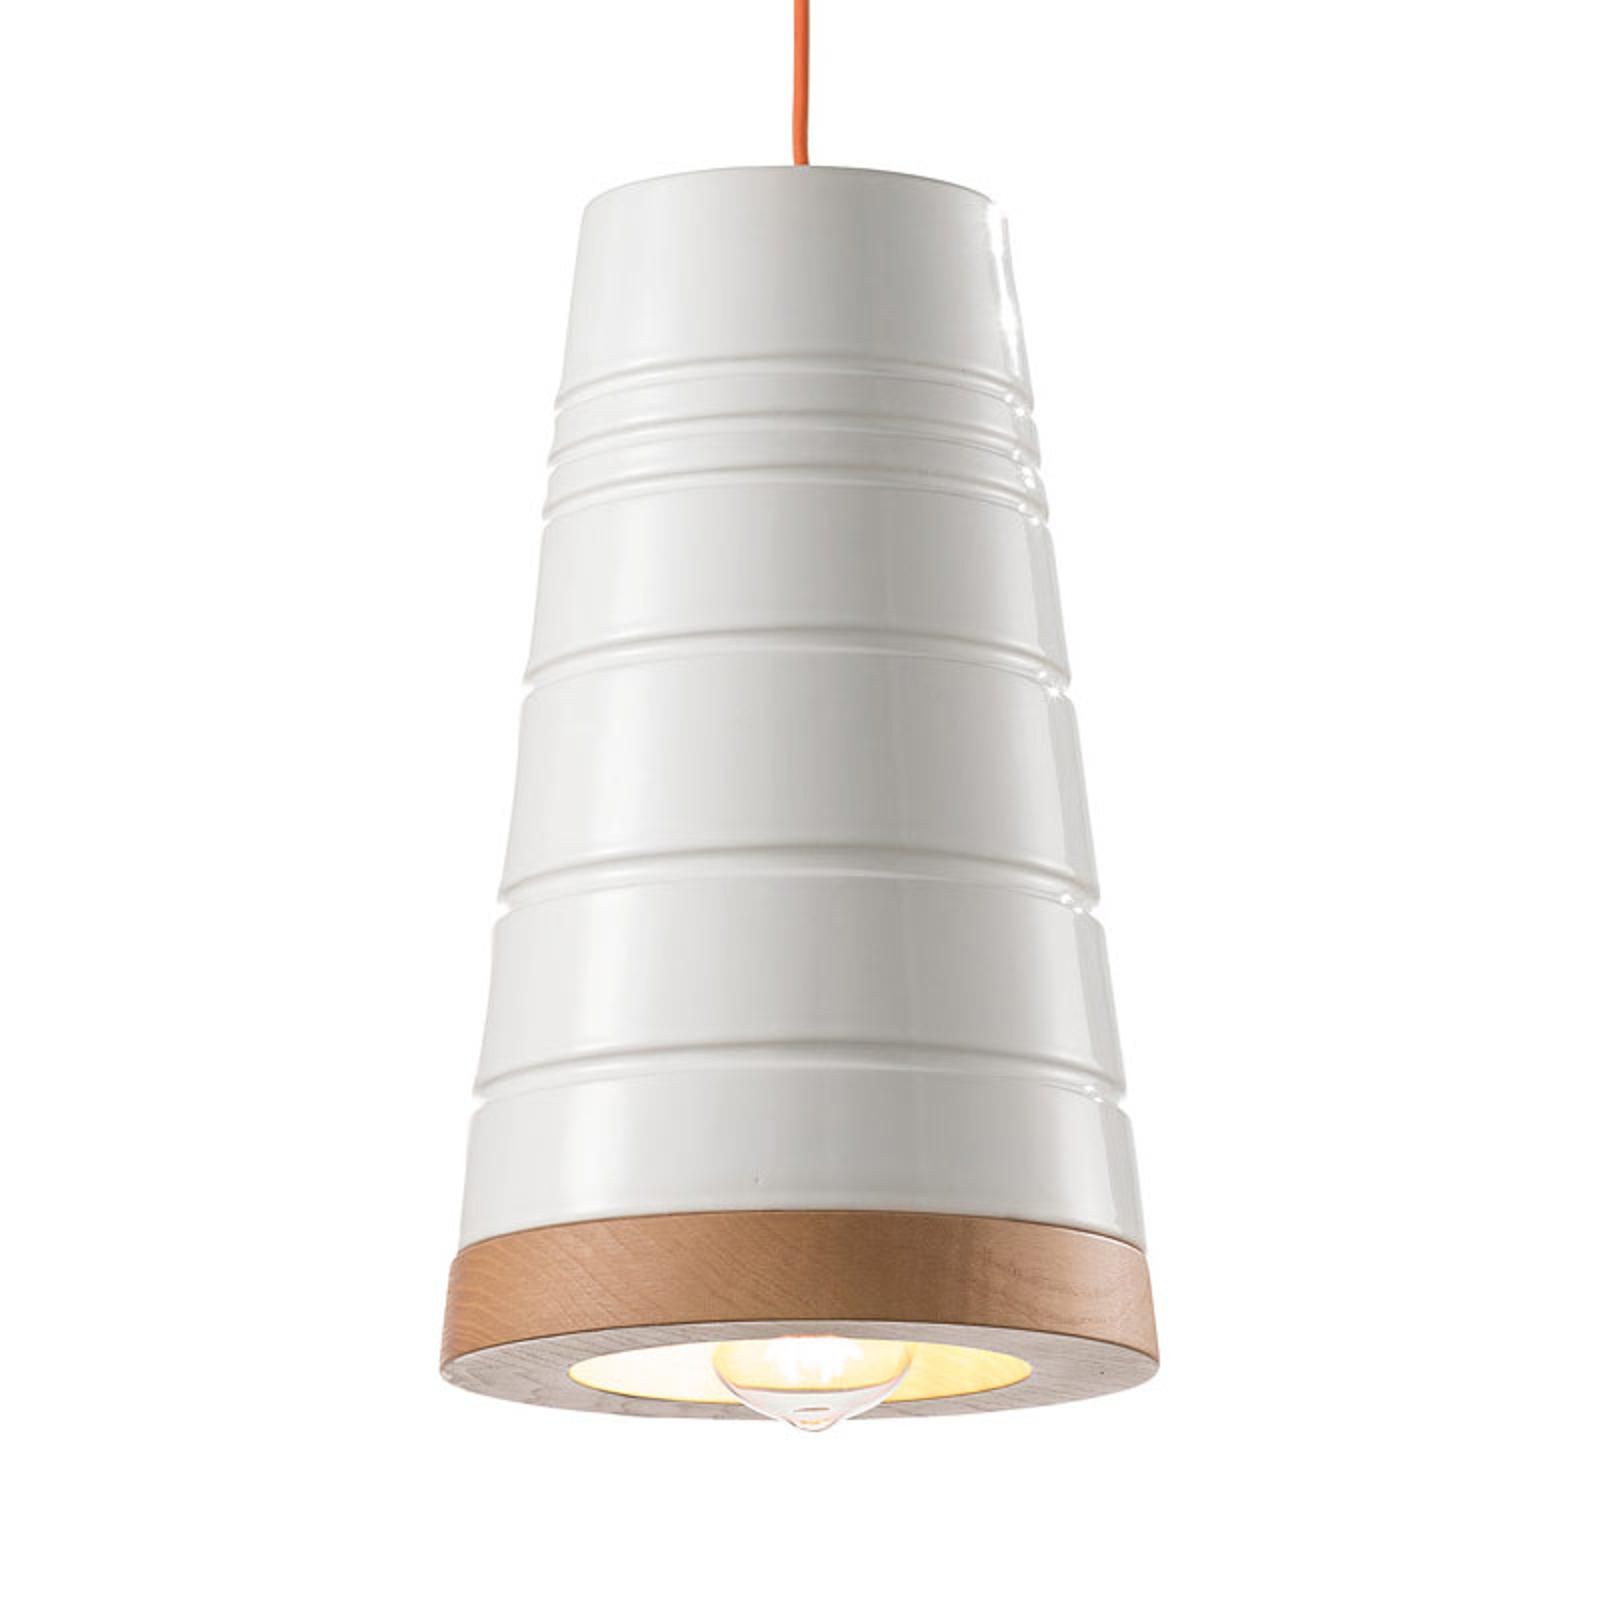 Skandinavisk, keramisk hængelampe C1785 hvid